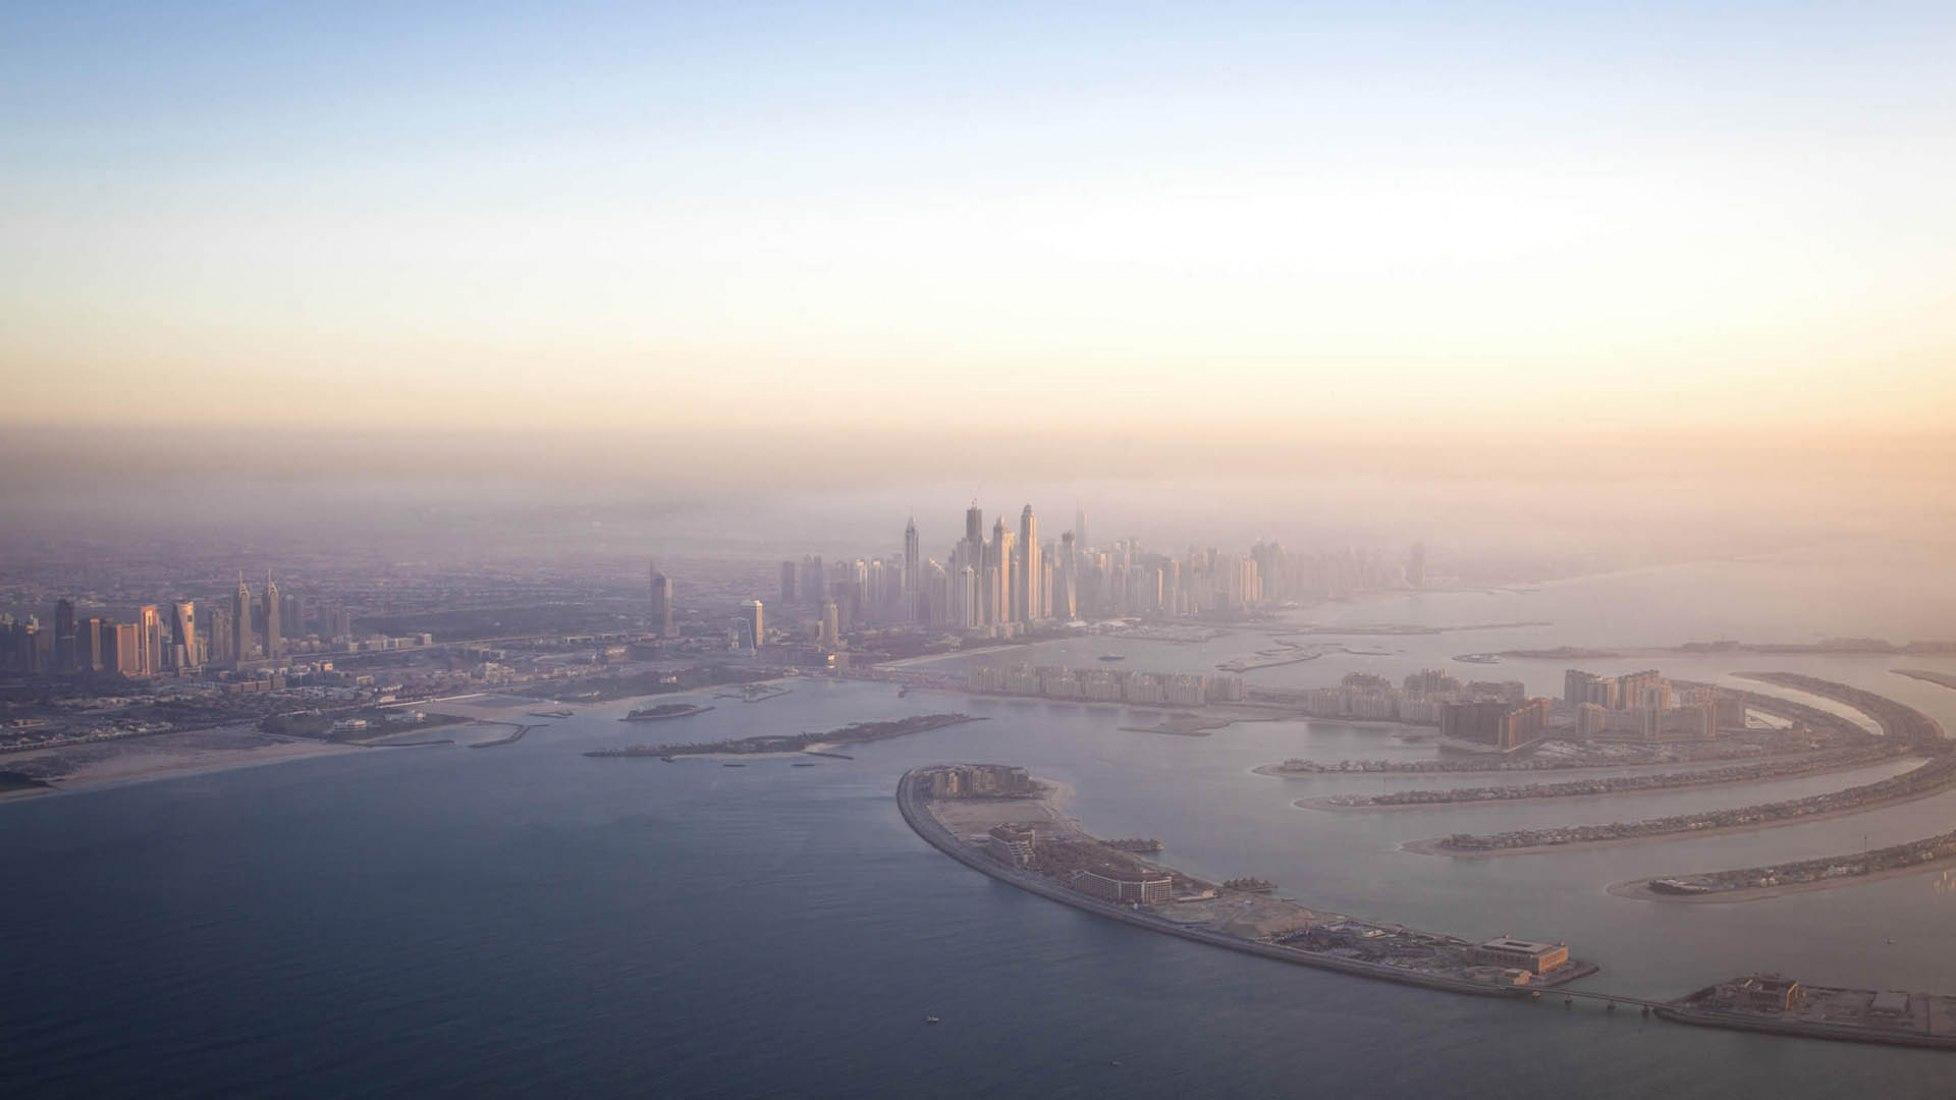 Jumeirah - Dubai overview. Muraba Residences by RCR Arquitectes. Photograph © Airey Spaces.